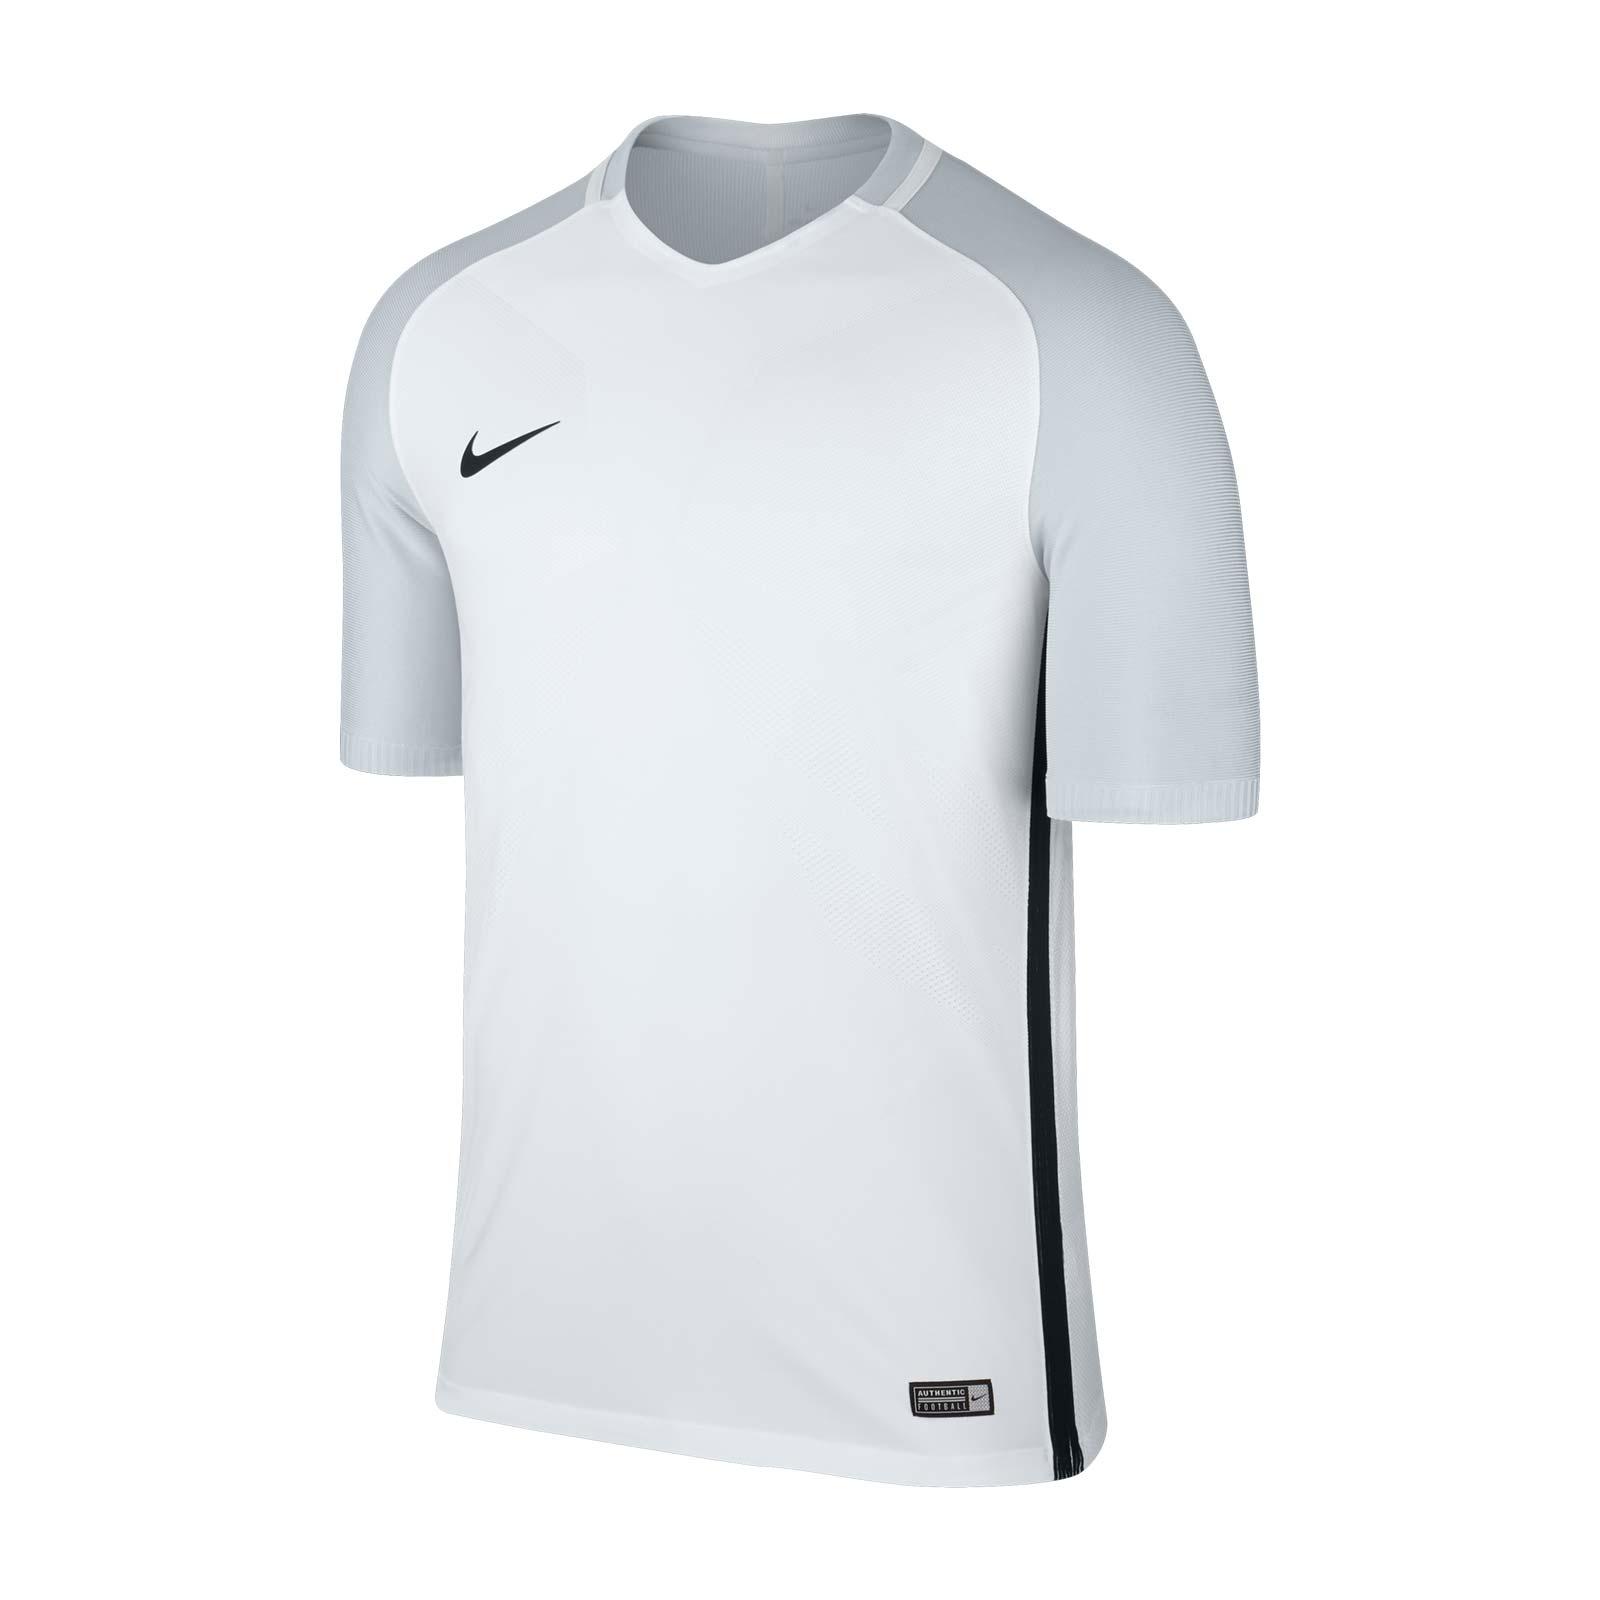 maillot-football-nike-vapor-1-jersey-teamwear-blanc